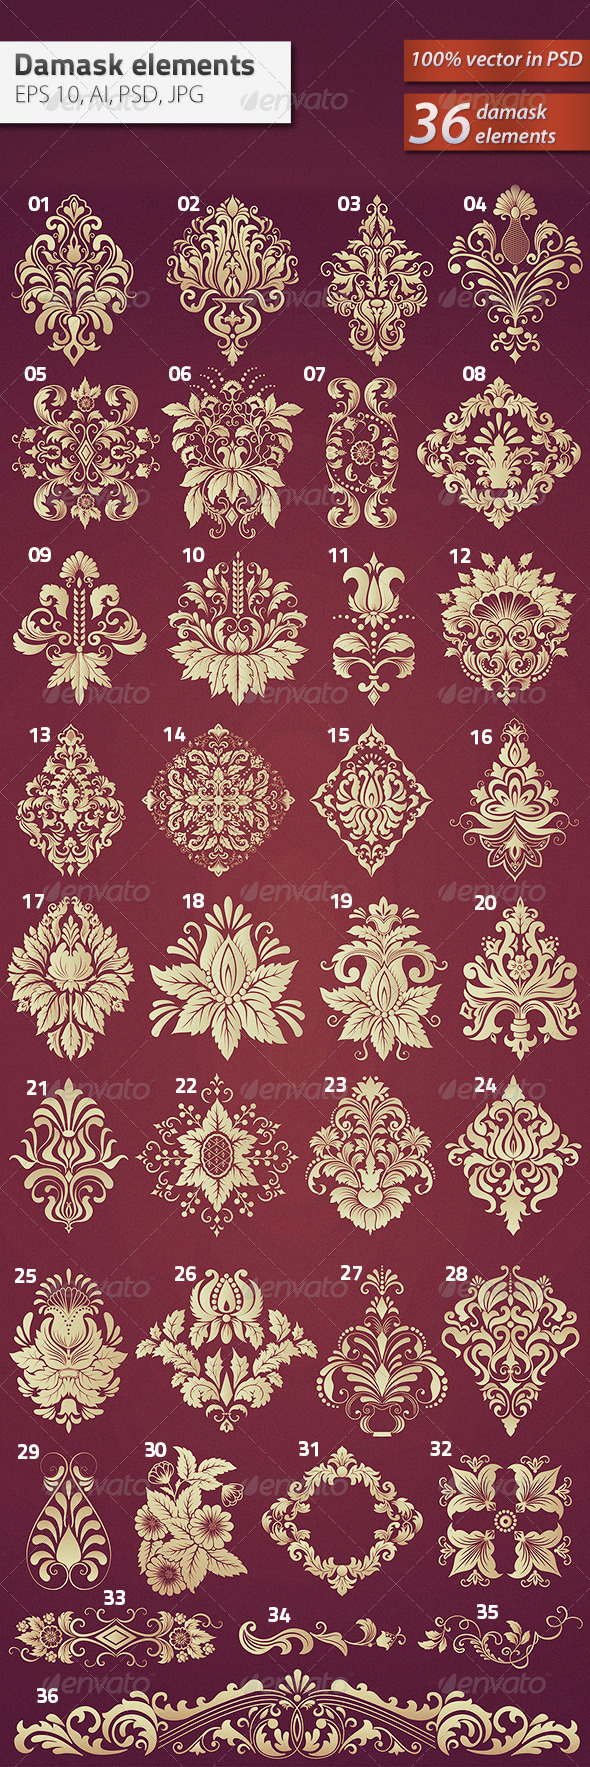 GraphicRiver 36 Damask Ornamental Elements 6184104